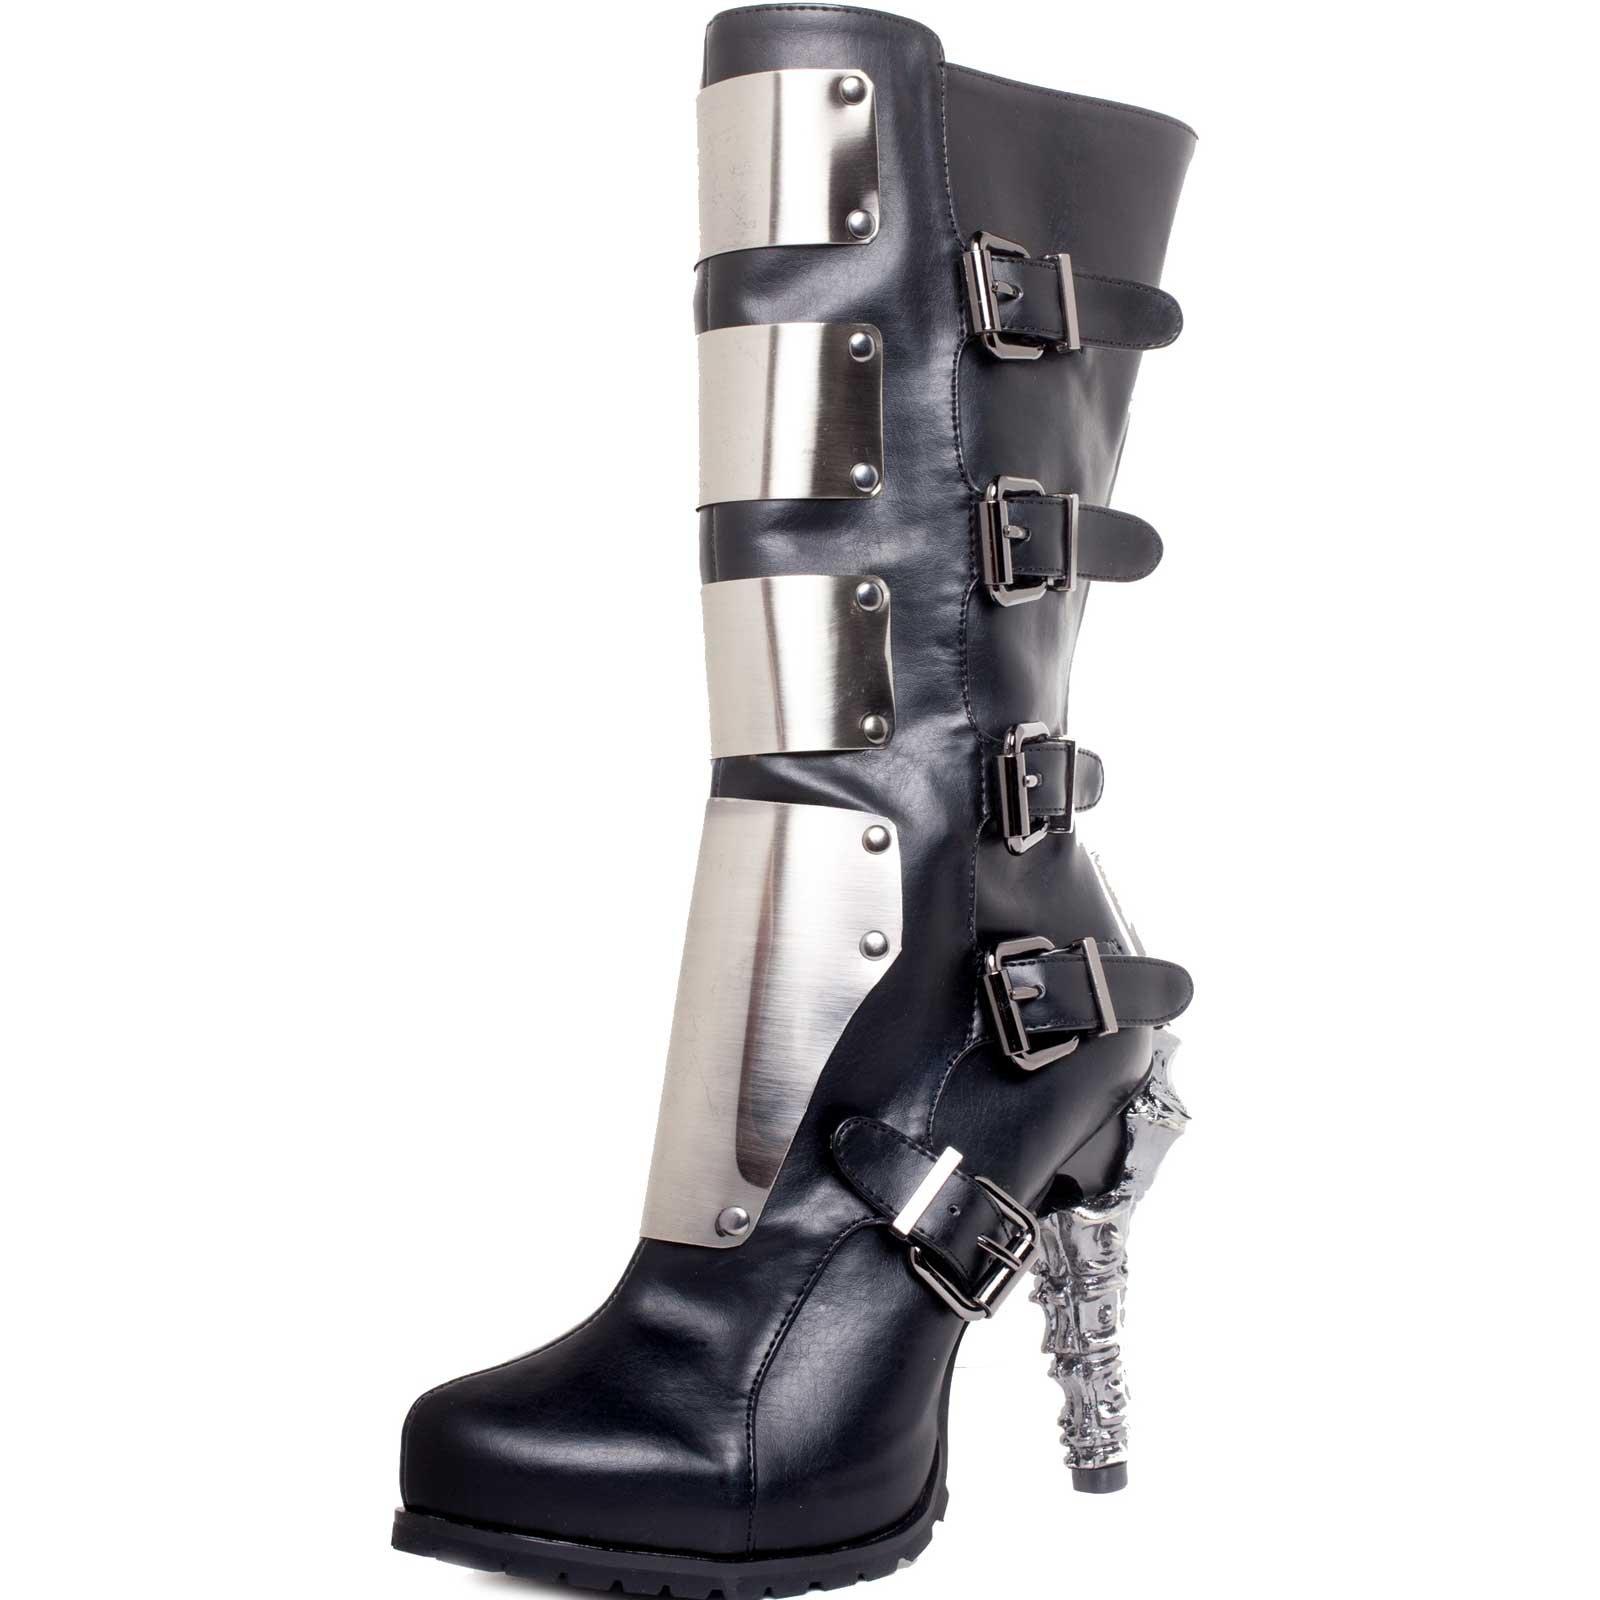 HADES Steampunk Prehistoric Claw Heel Knee High Biker Boot Inner Zip VARGA Black-9